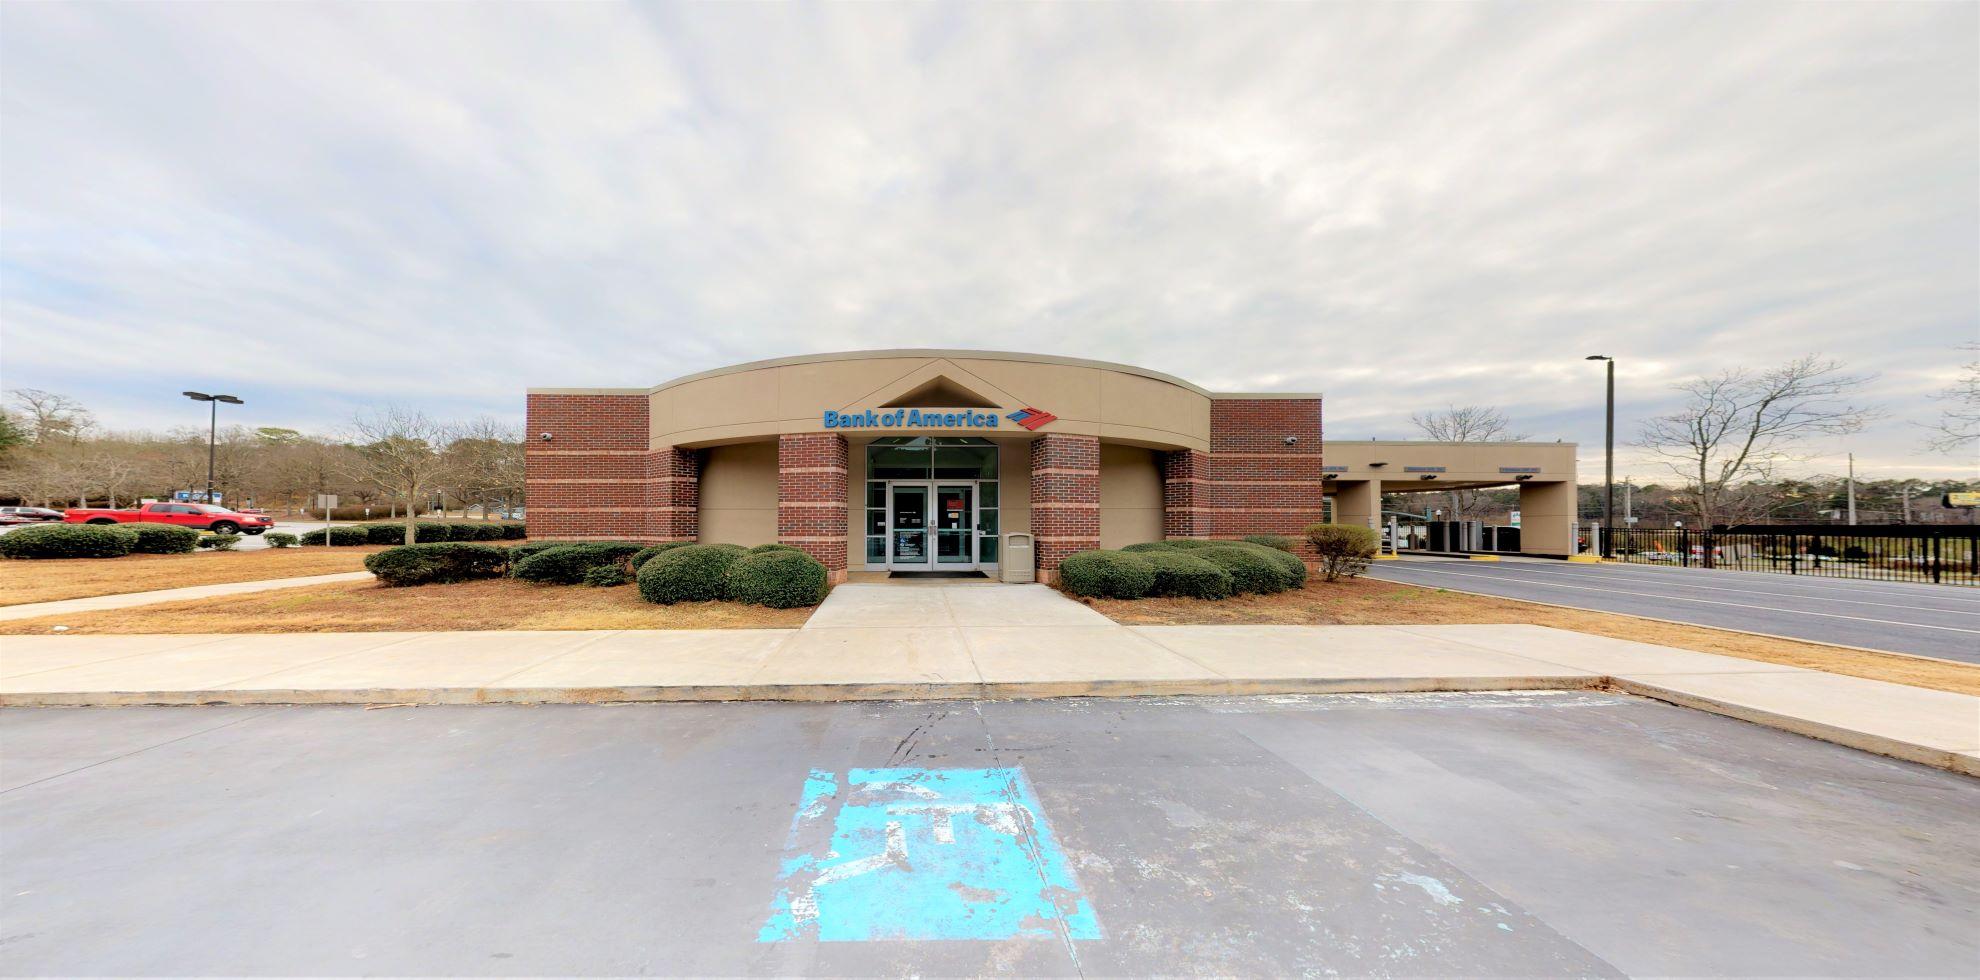 Bank of America financial center with drive-thru ATM   3495 Cascade Rd SW, Atlanta, GA 30311